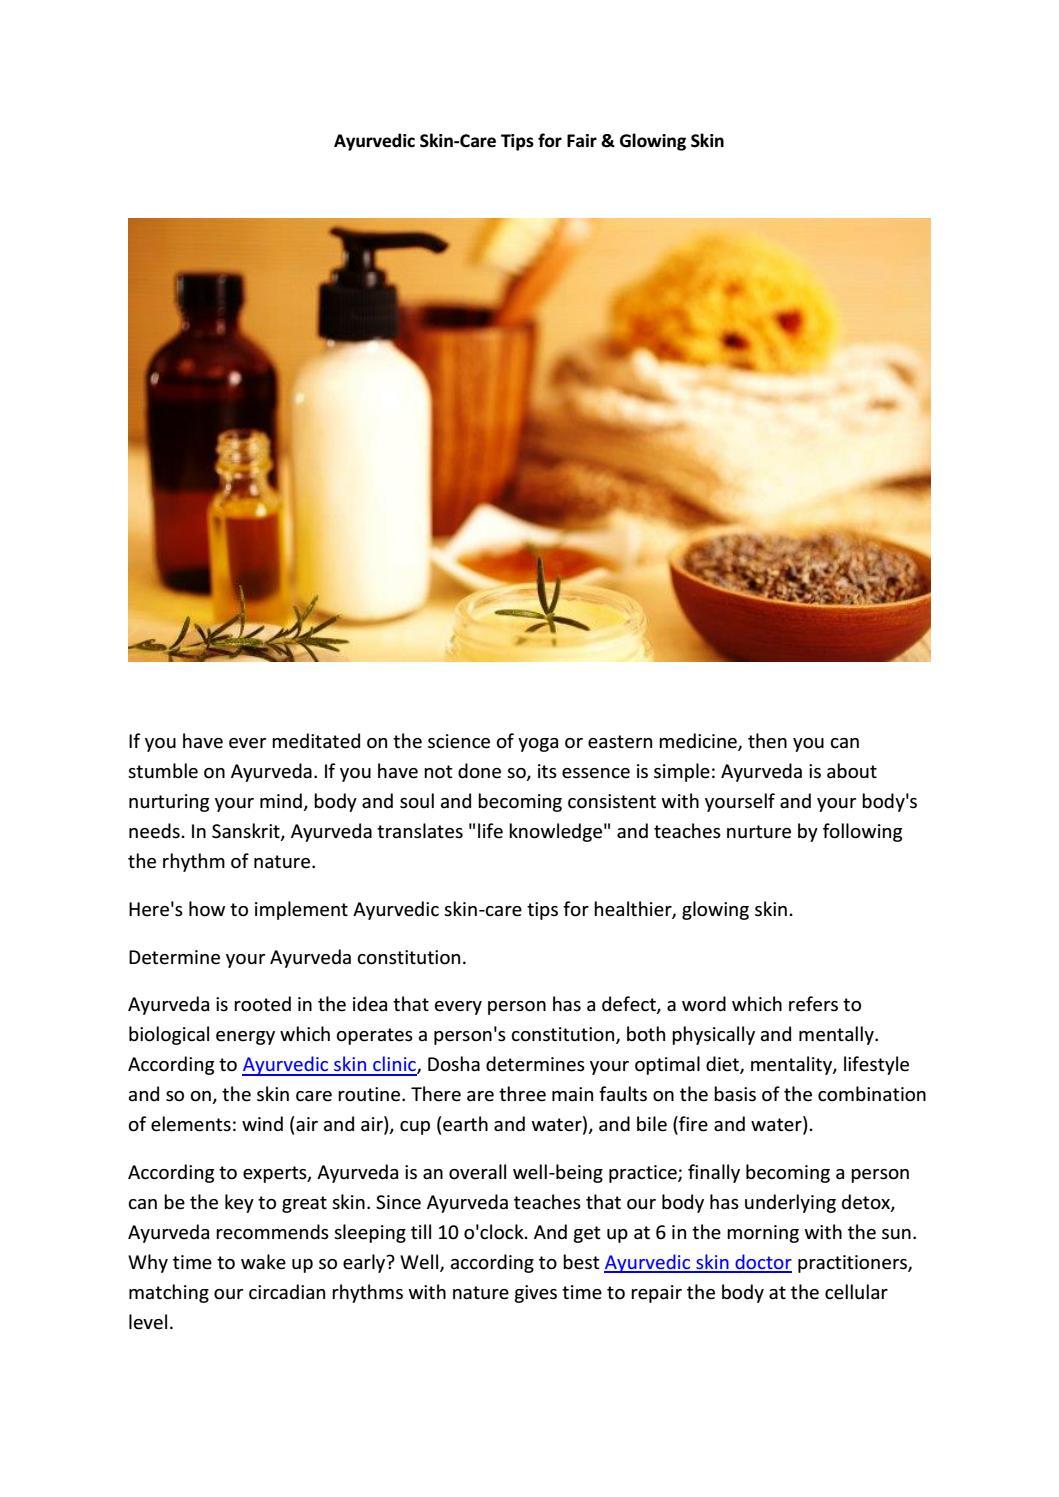 Ayurvedic Skin-Care Tips for Fair & Glowing Skin by R-Oxygen Skin